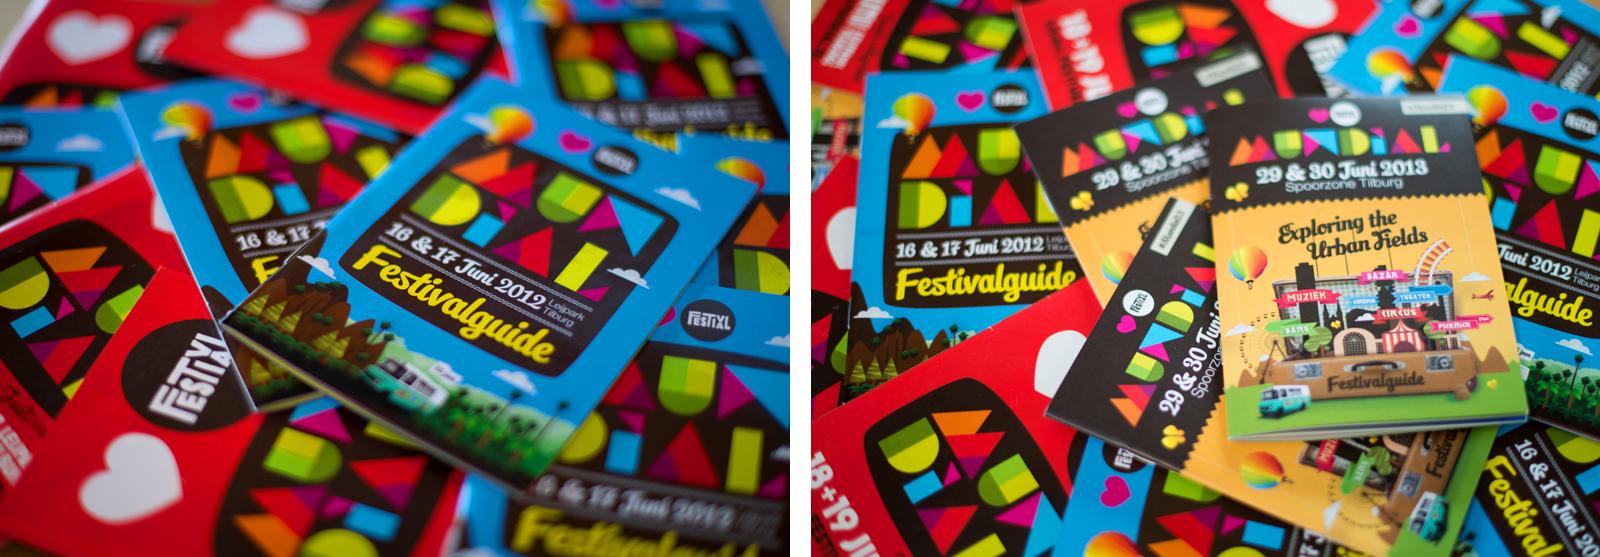 TC8L_Mundial-festivalguide